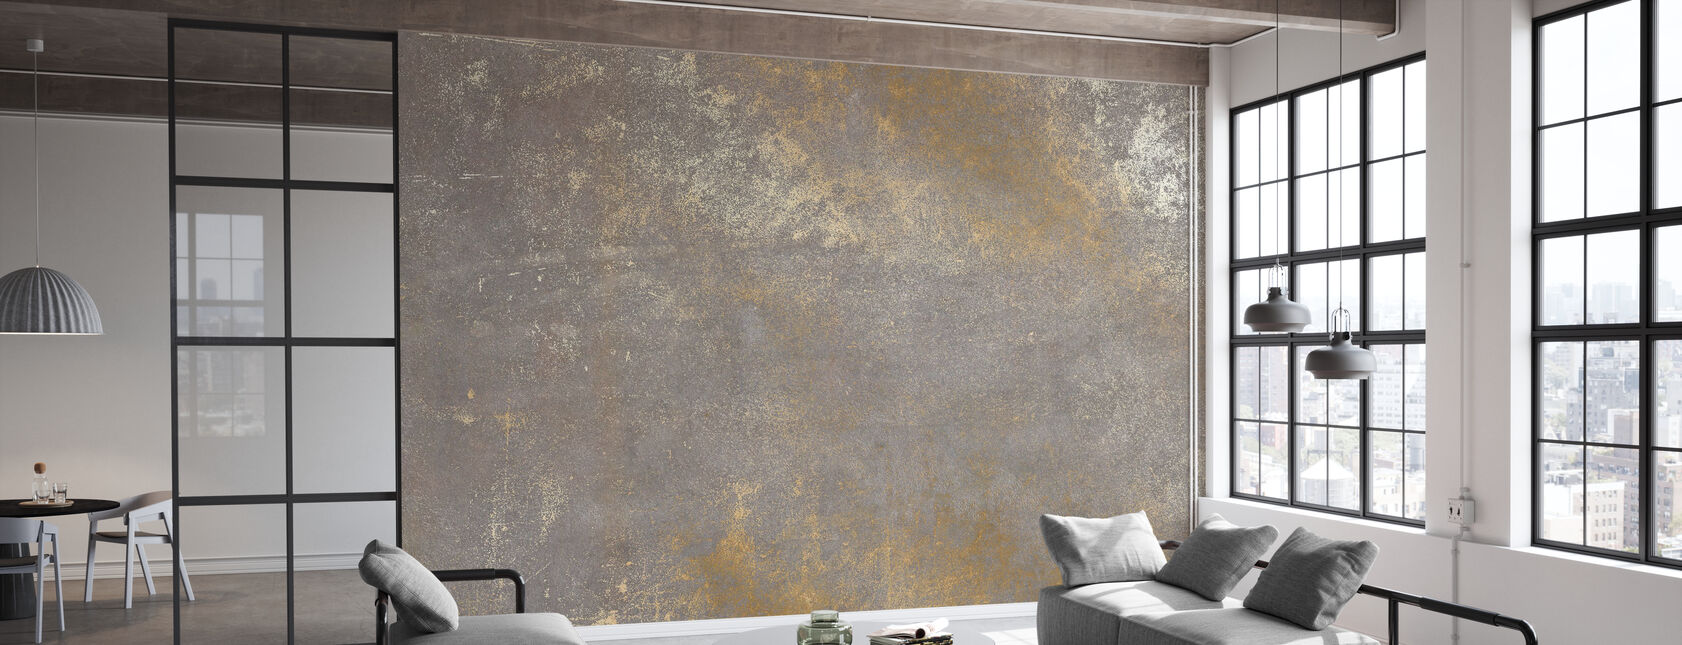 Gold auf Betonmauer - Tapete - Büro